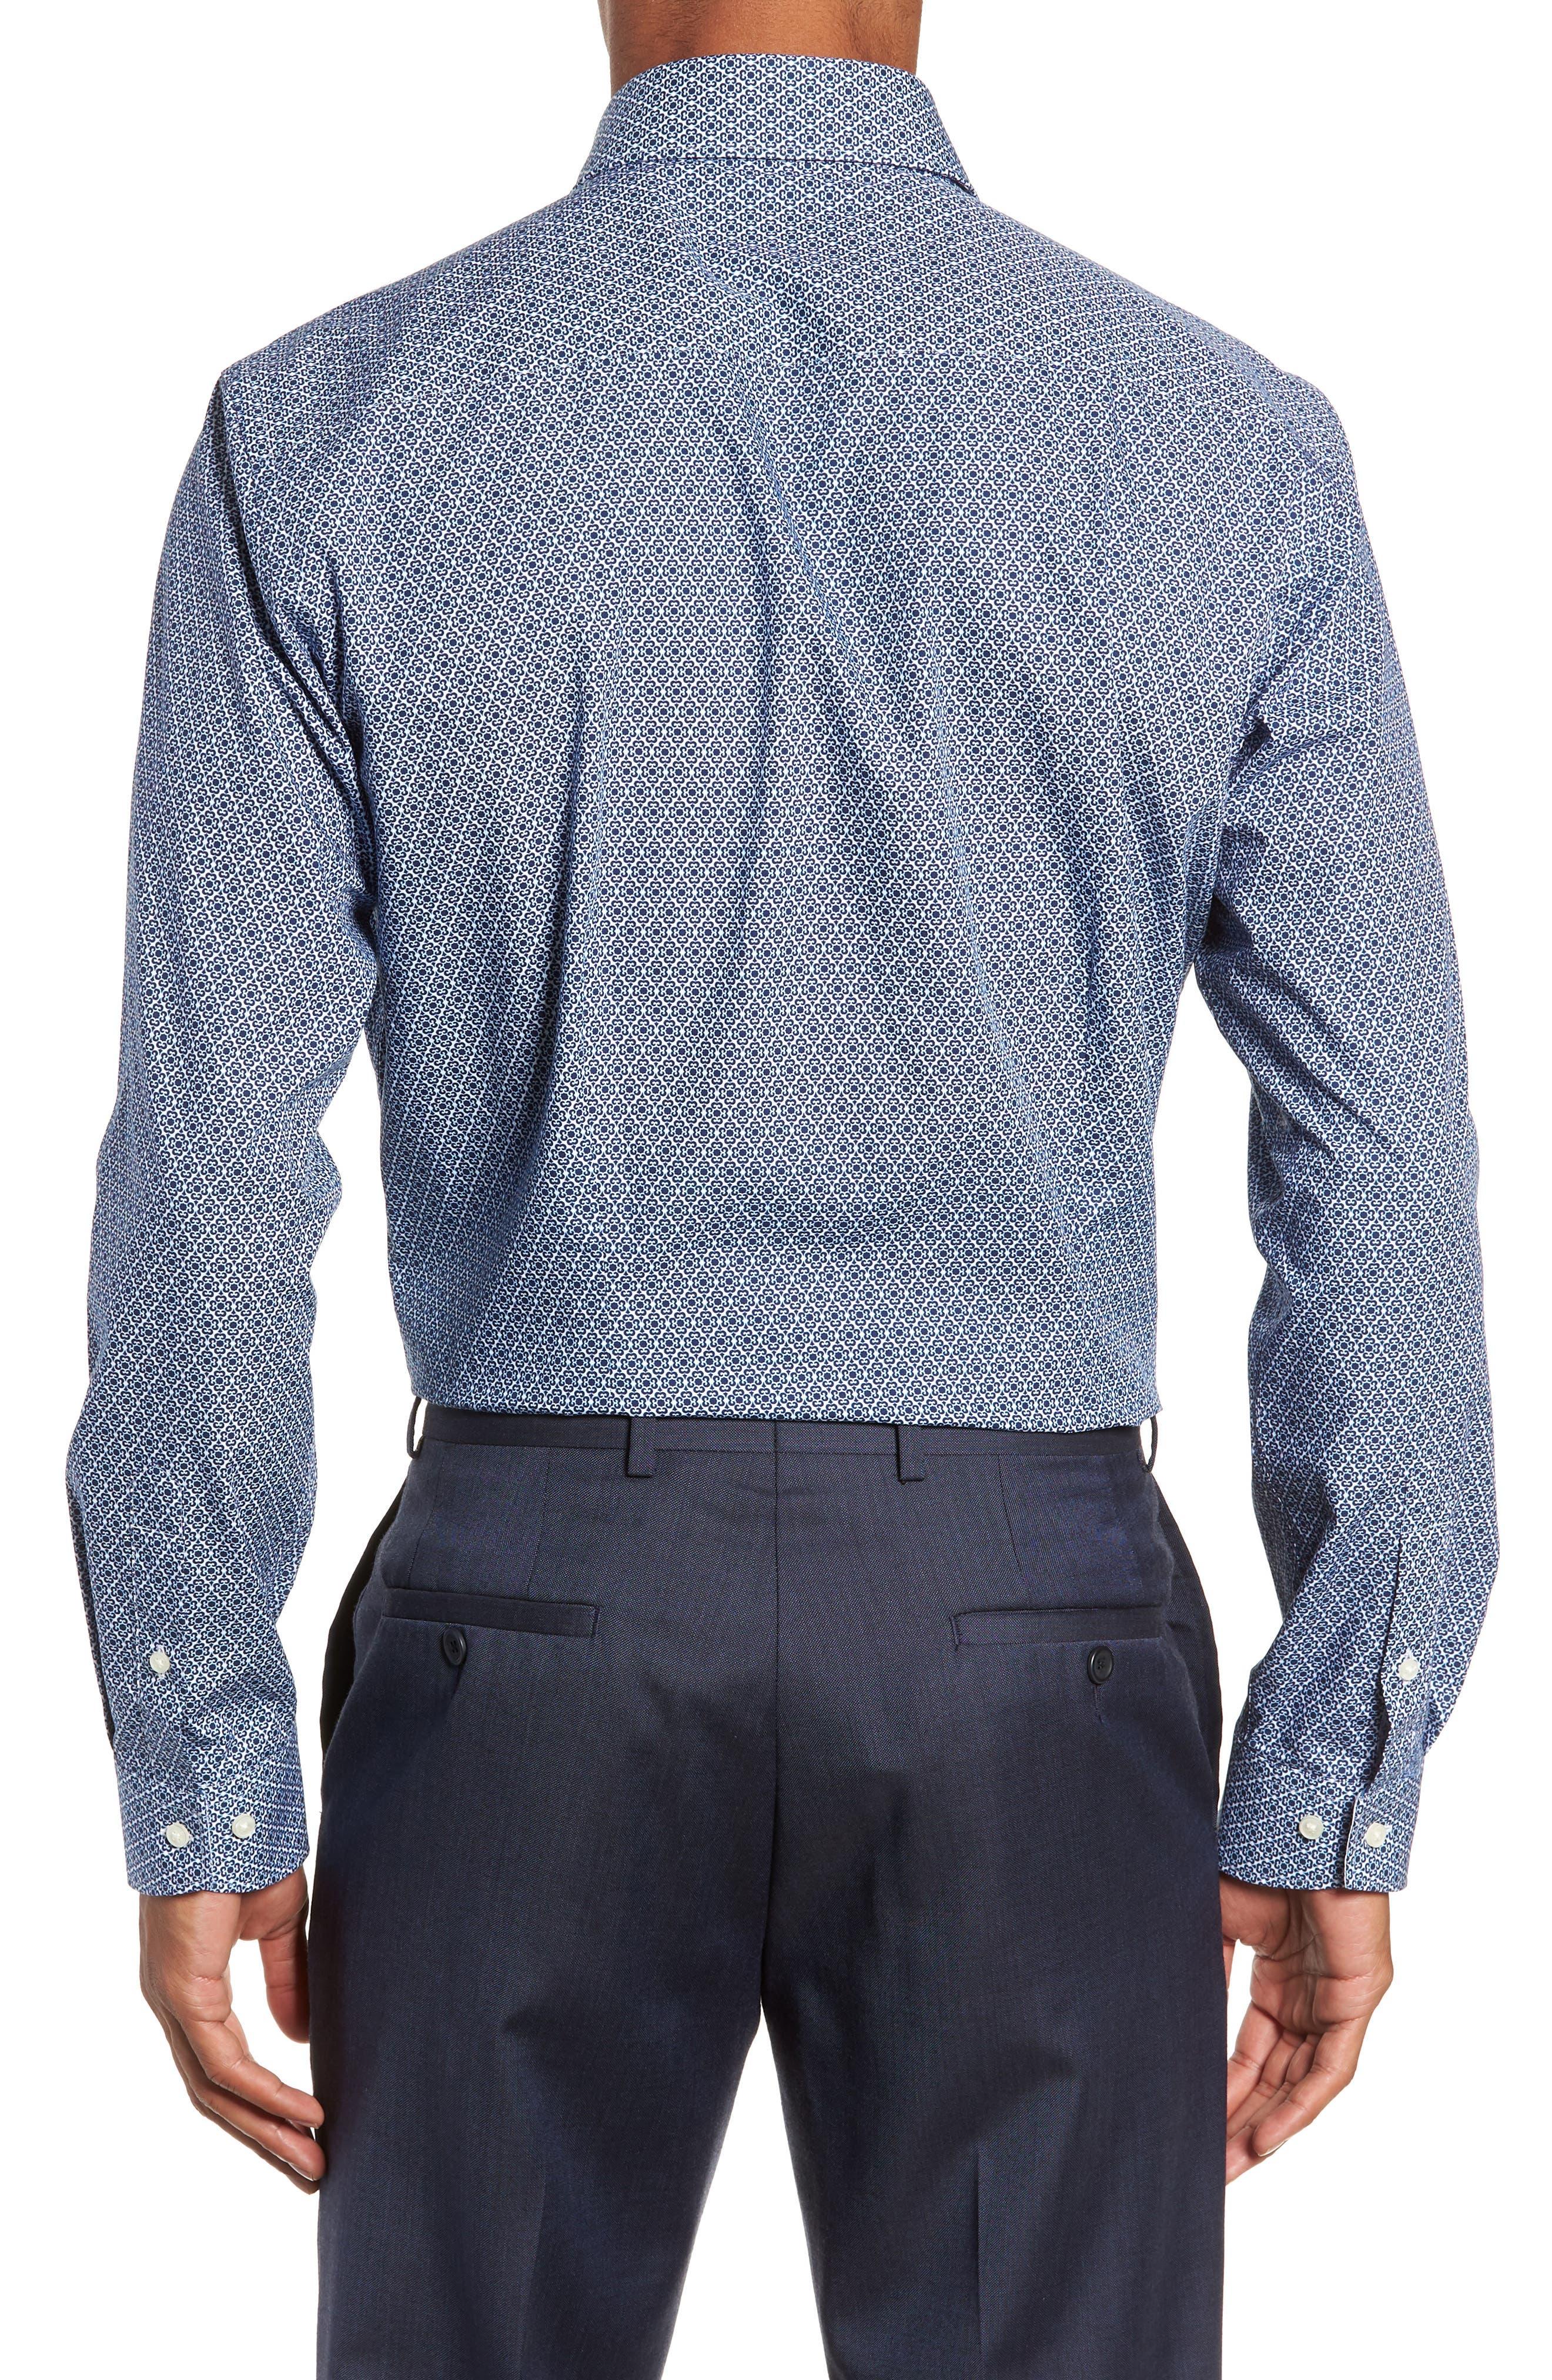 Slestmi Slim Fit Print Dress Shirt,                             Alternate thumbnail 3, color,                             BLUE